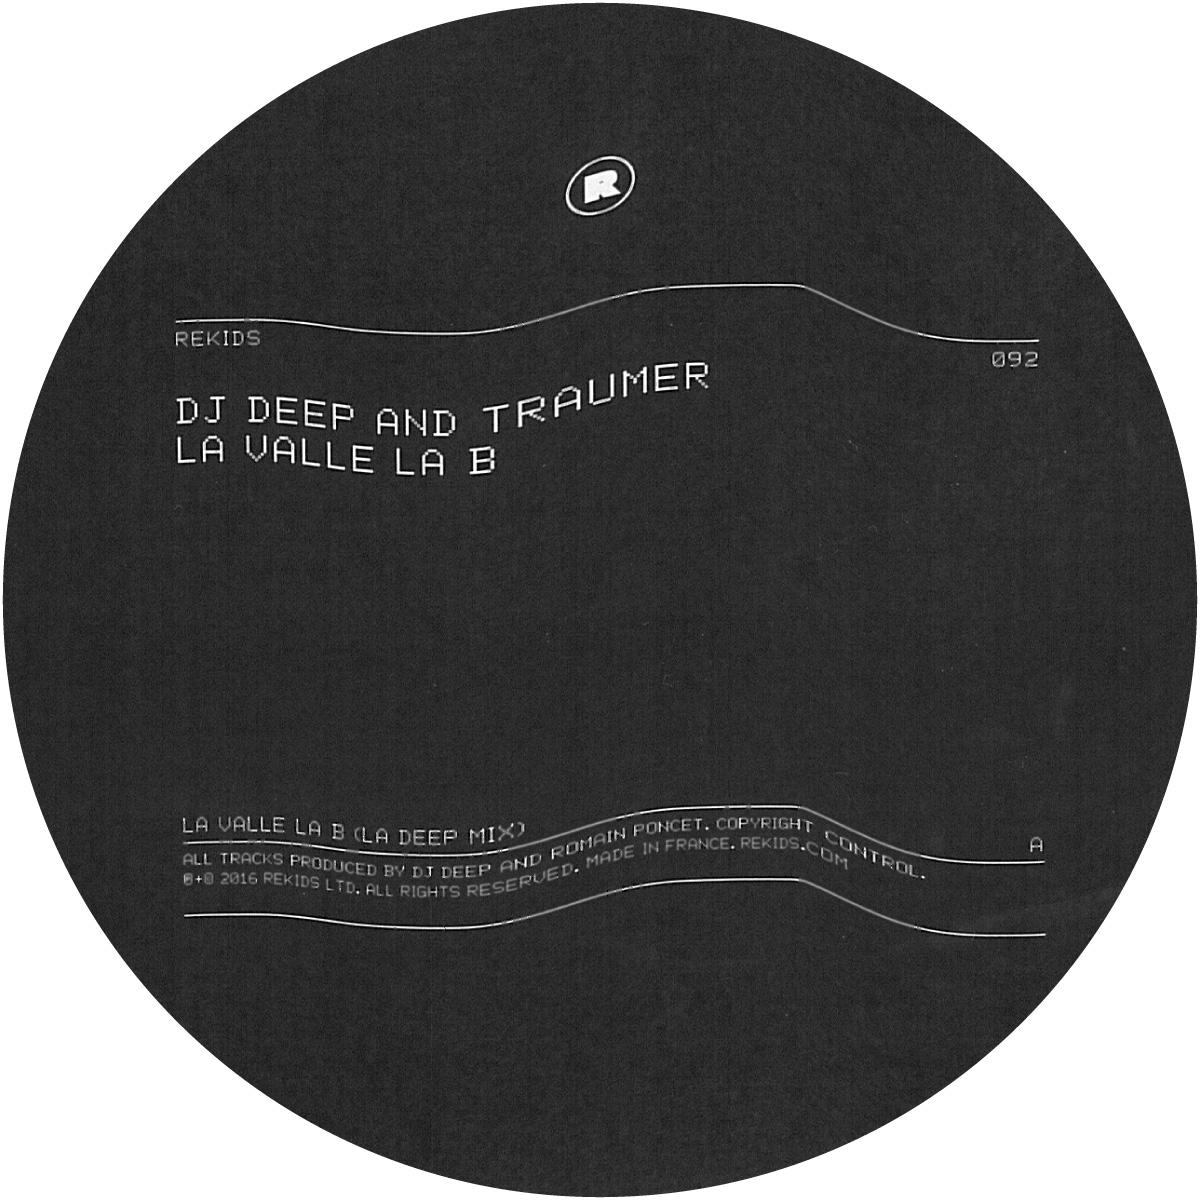 DJ Deep & Traumer – La Valle La B (La Spicy Mix)